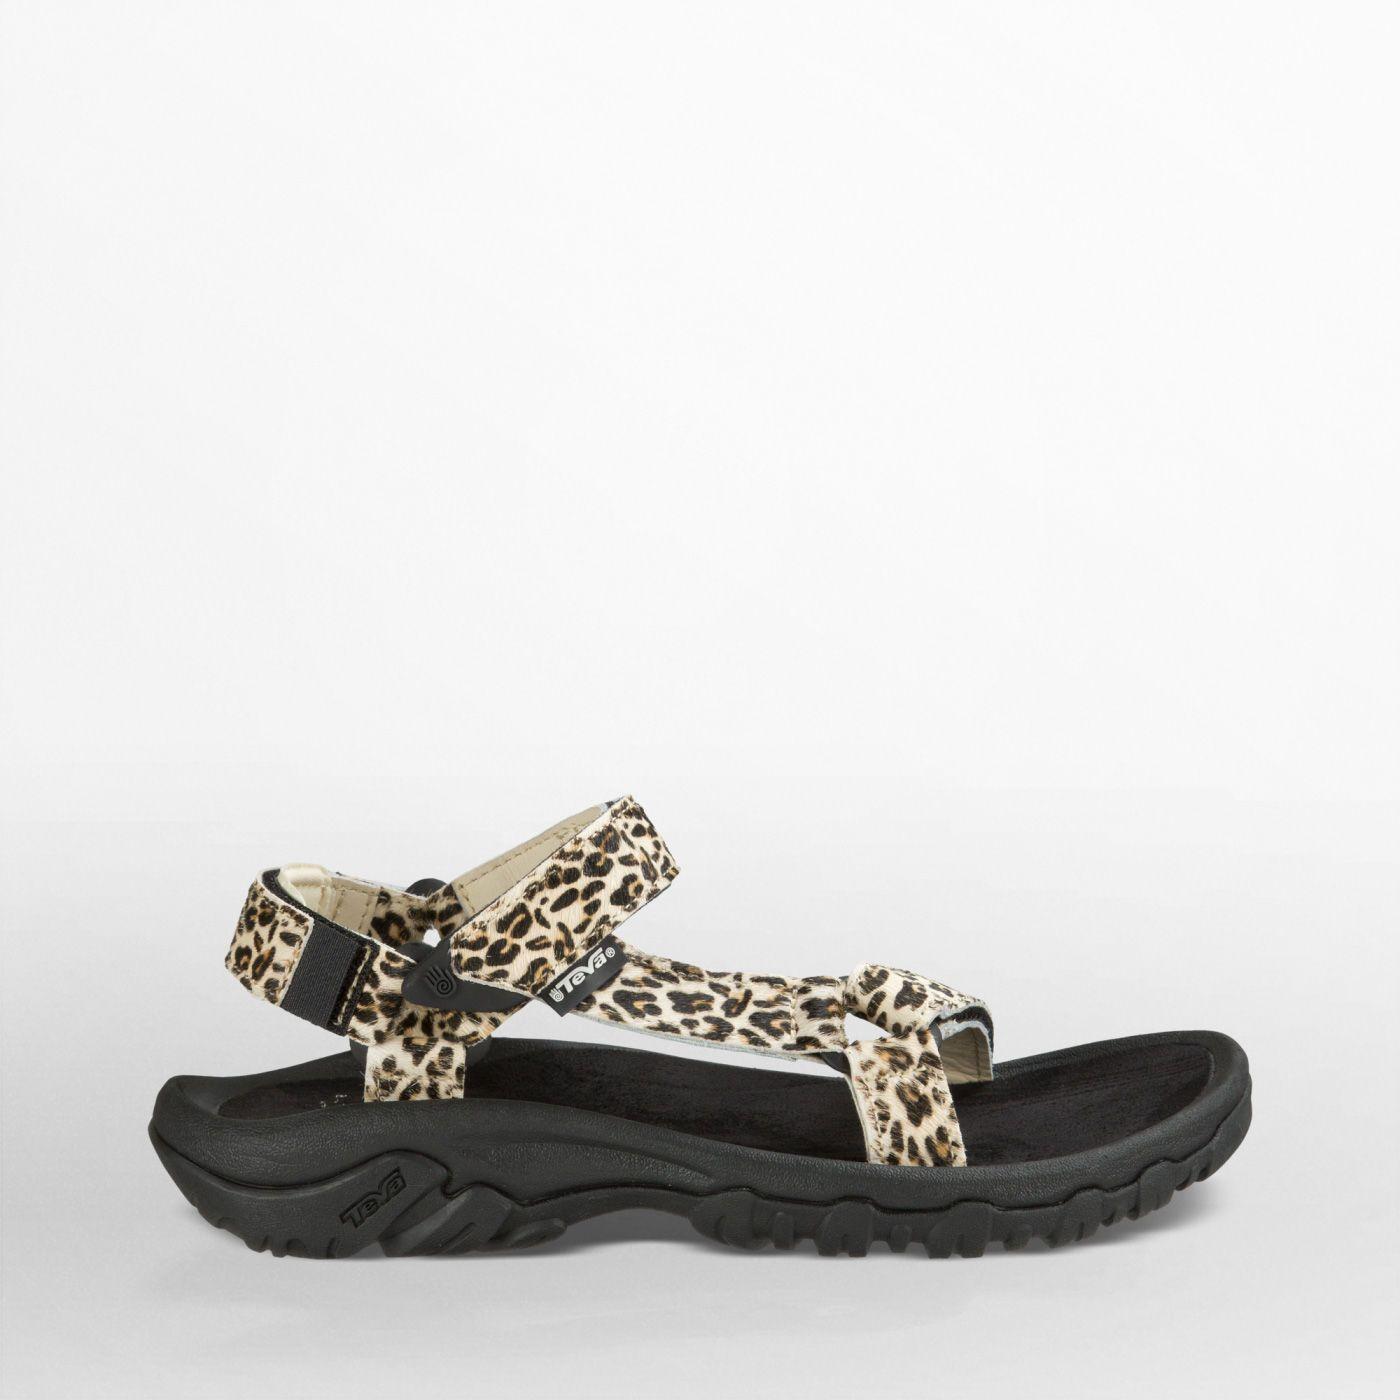 Womens sandals, Teva, Teva sandals